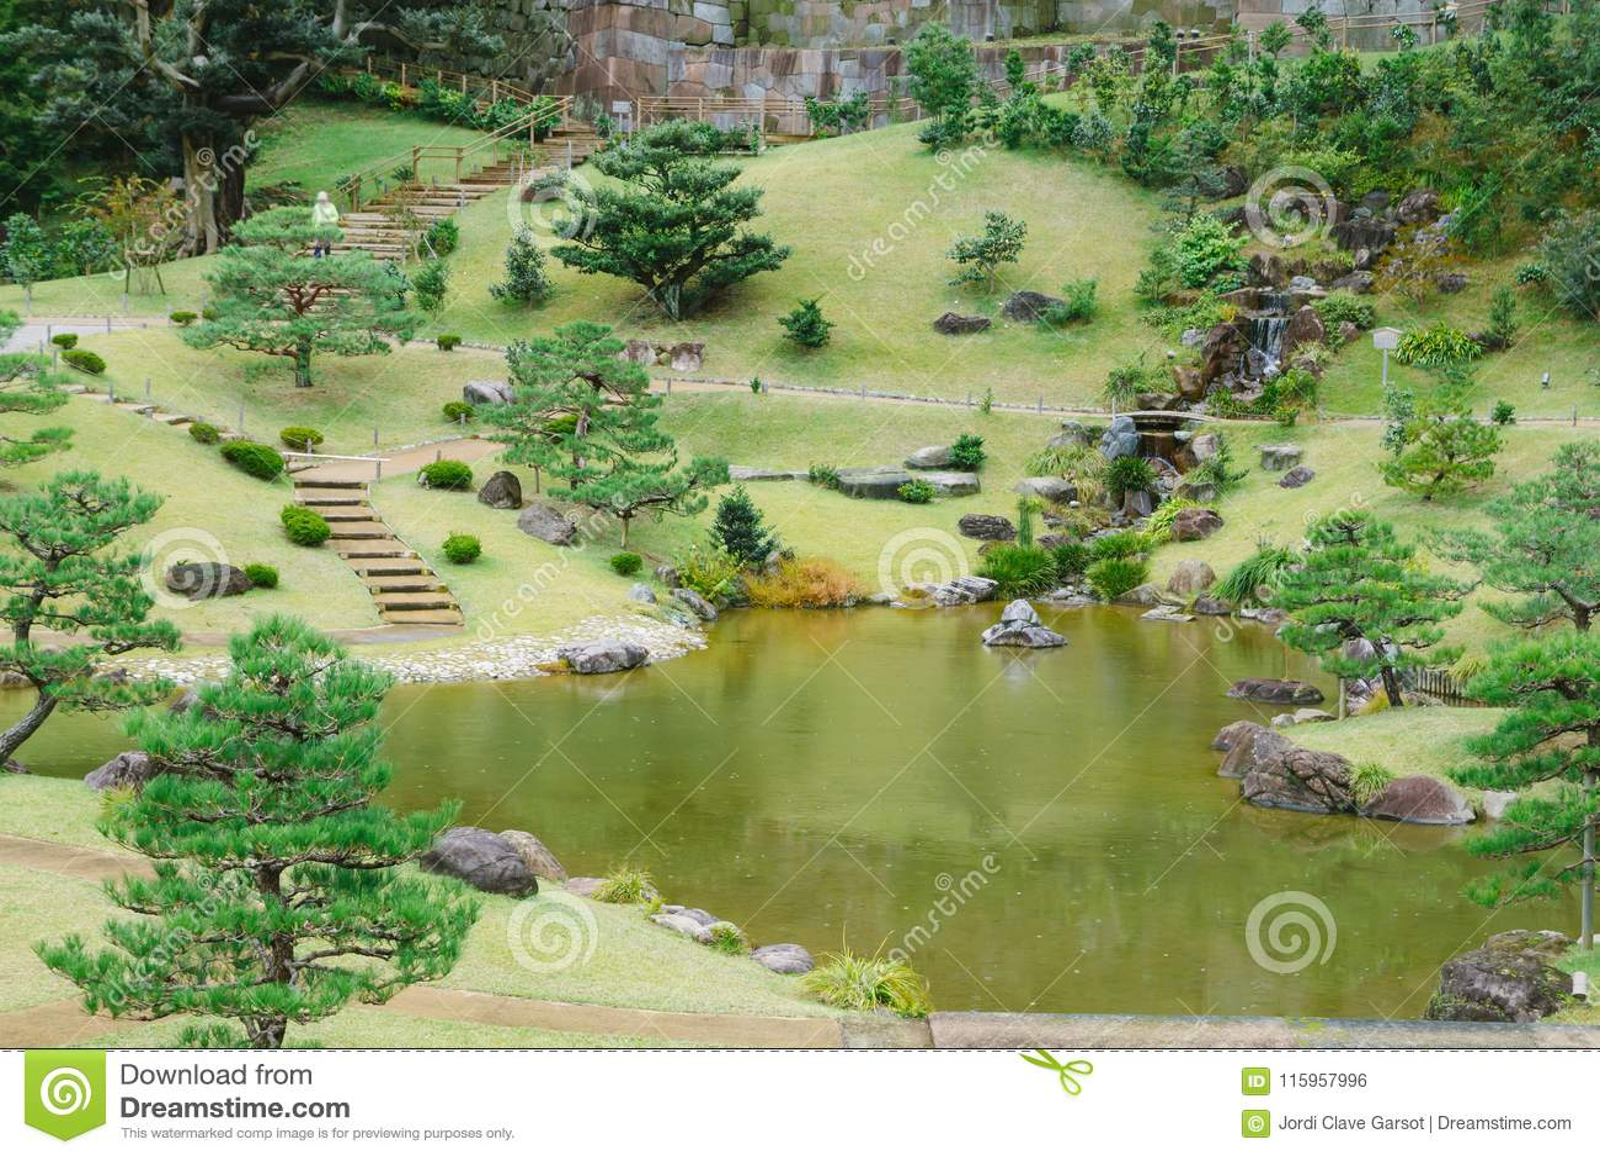 Kanazawa Gardens Japan Stock Photo Image Of Cityscape 115957996